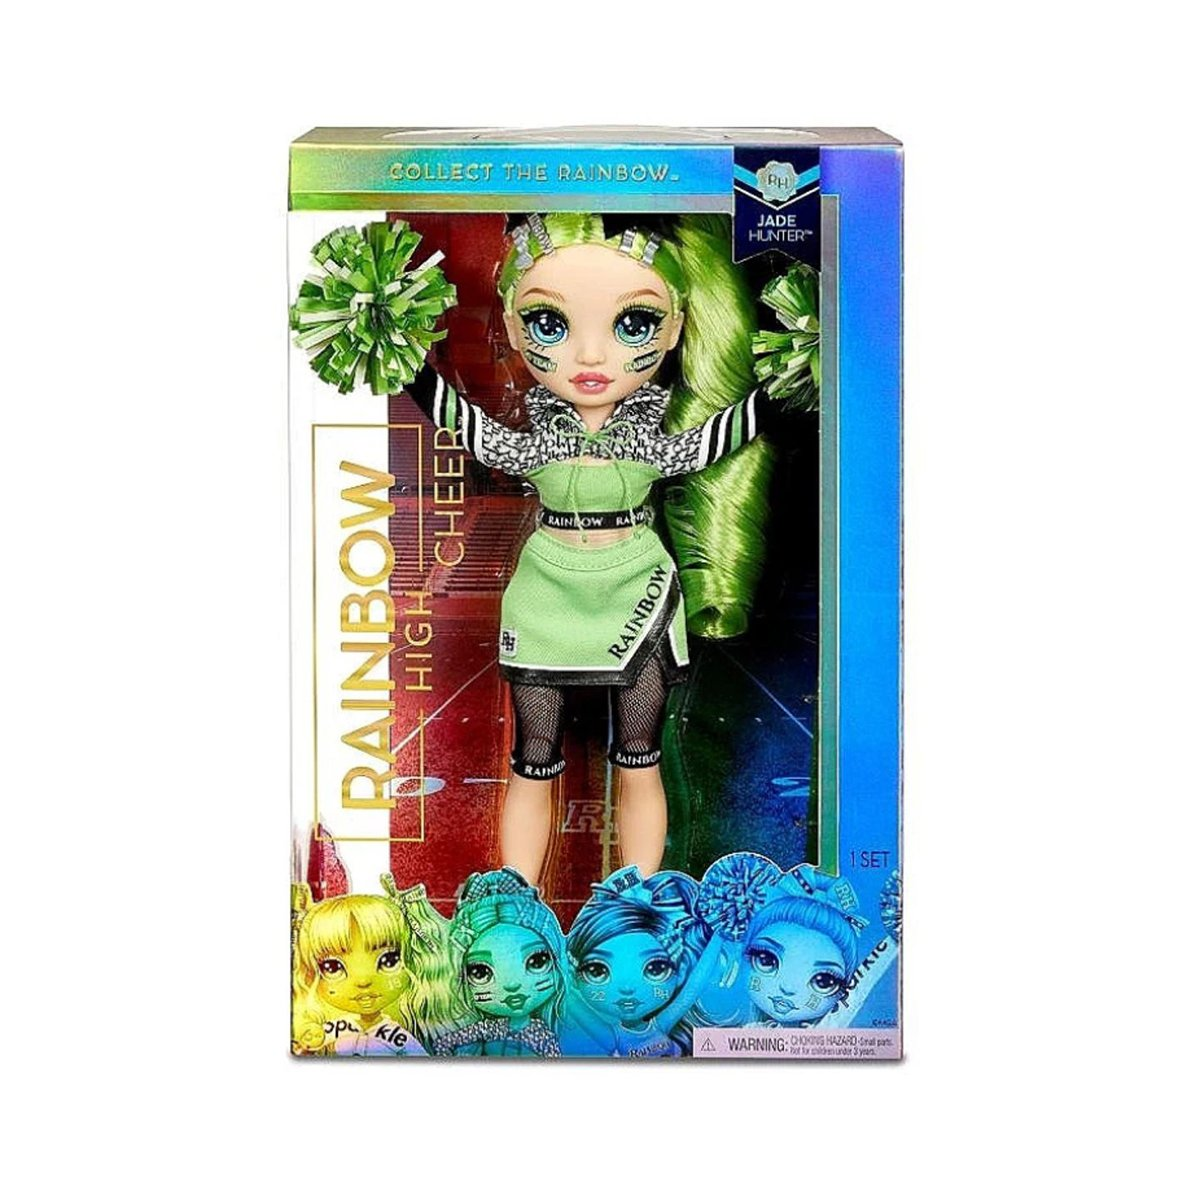 Papusa Majoreta Rainbow High, Jade Hunter, 572060EUC